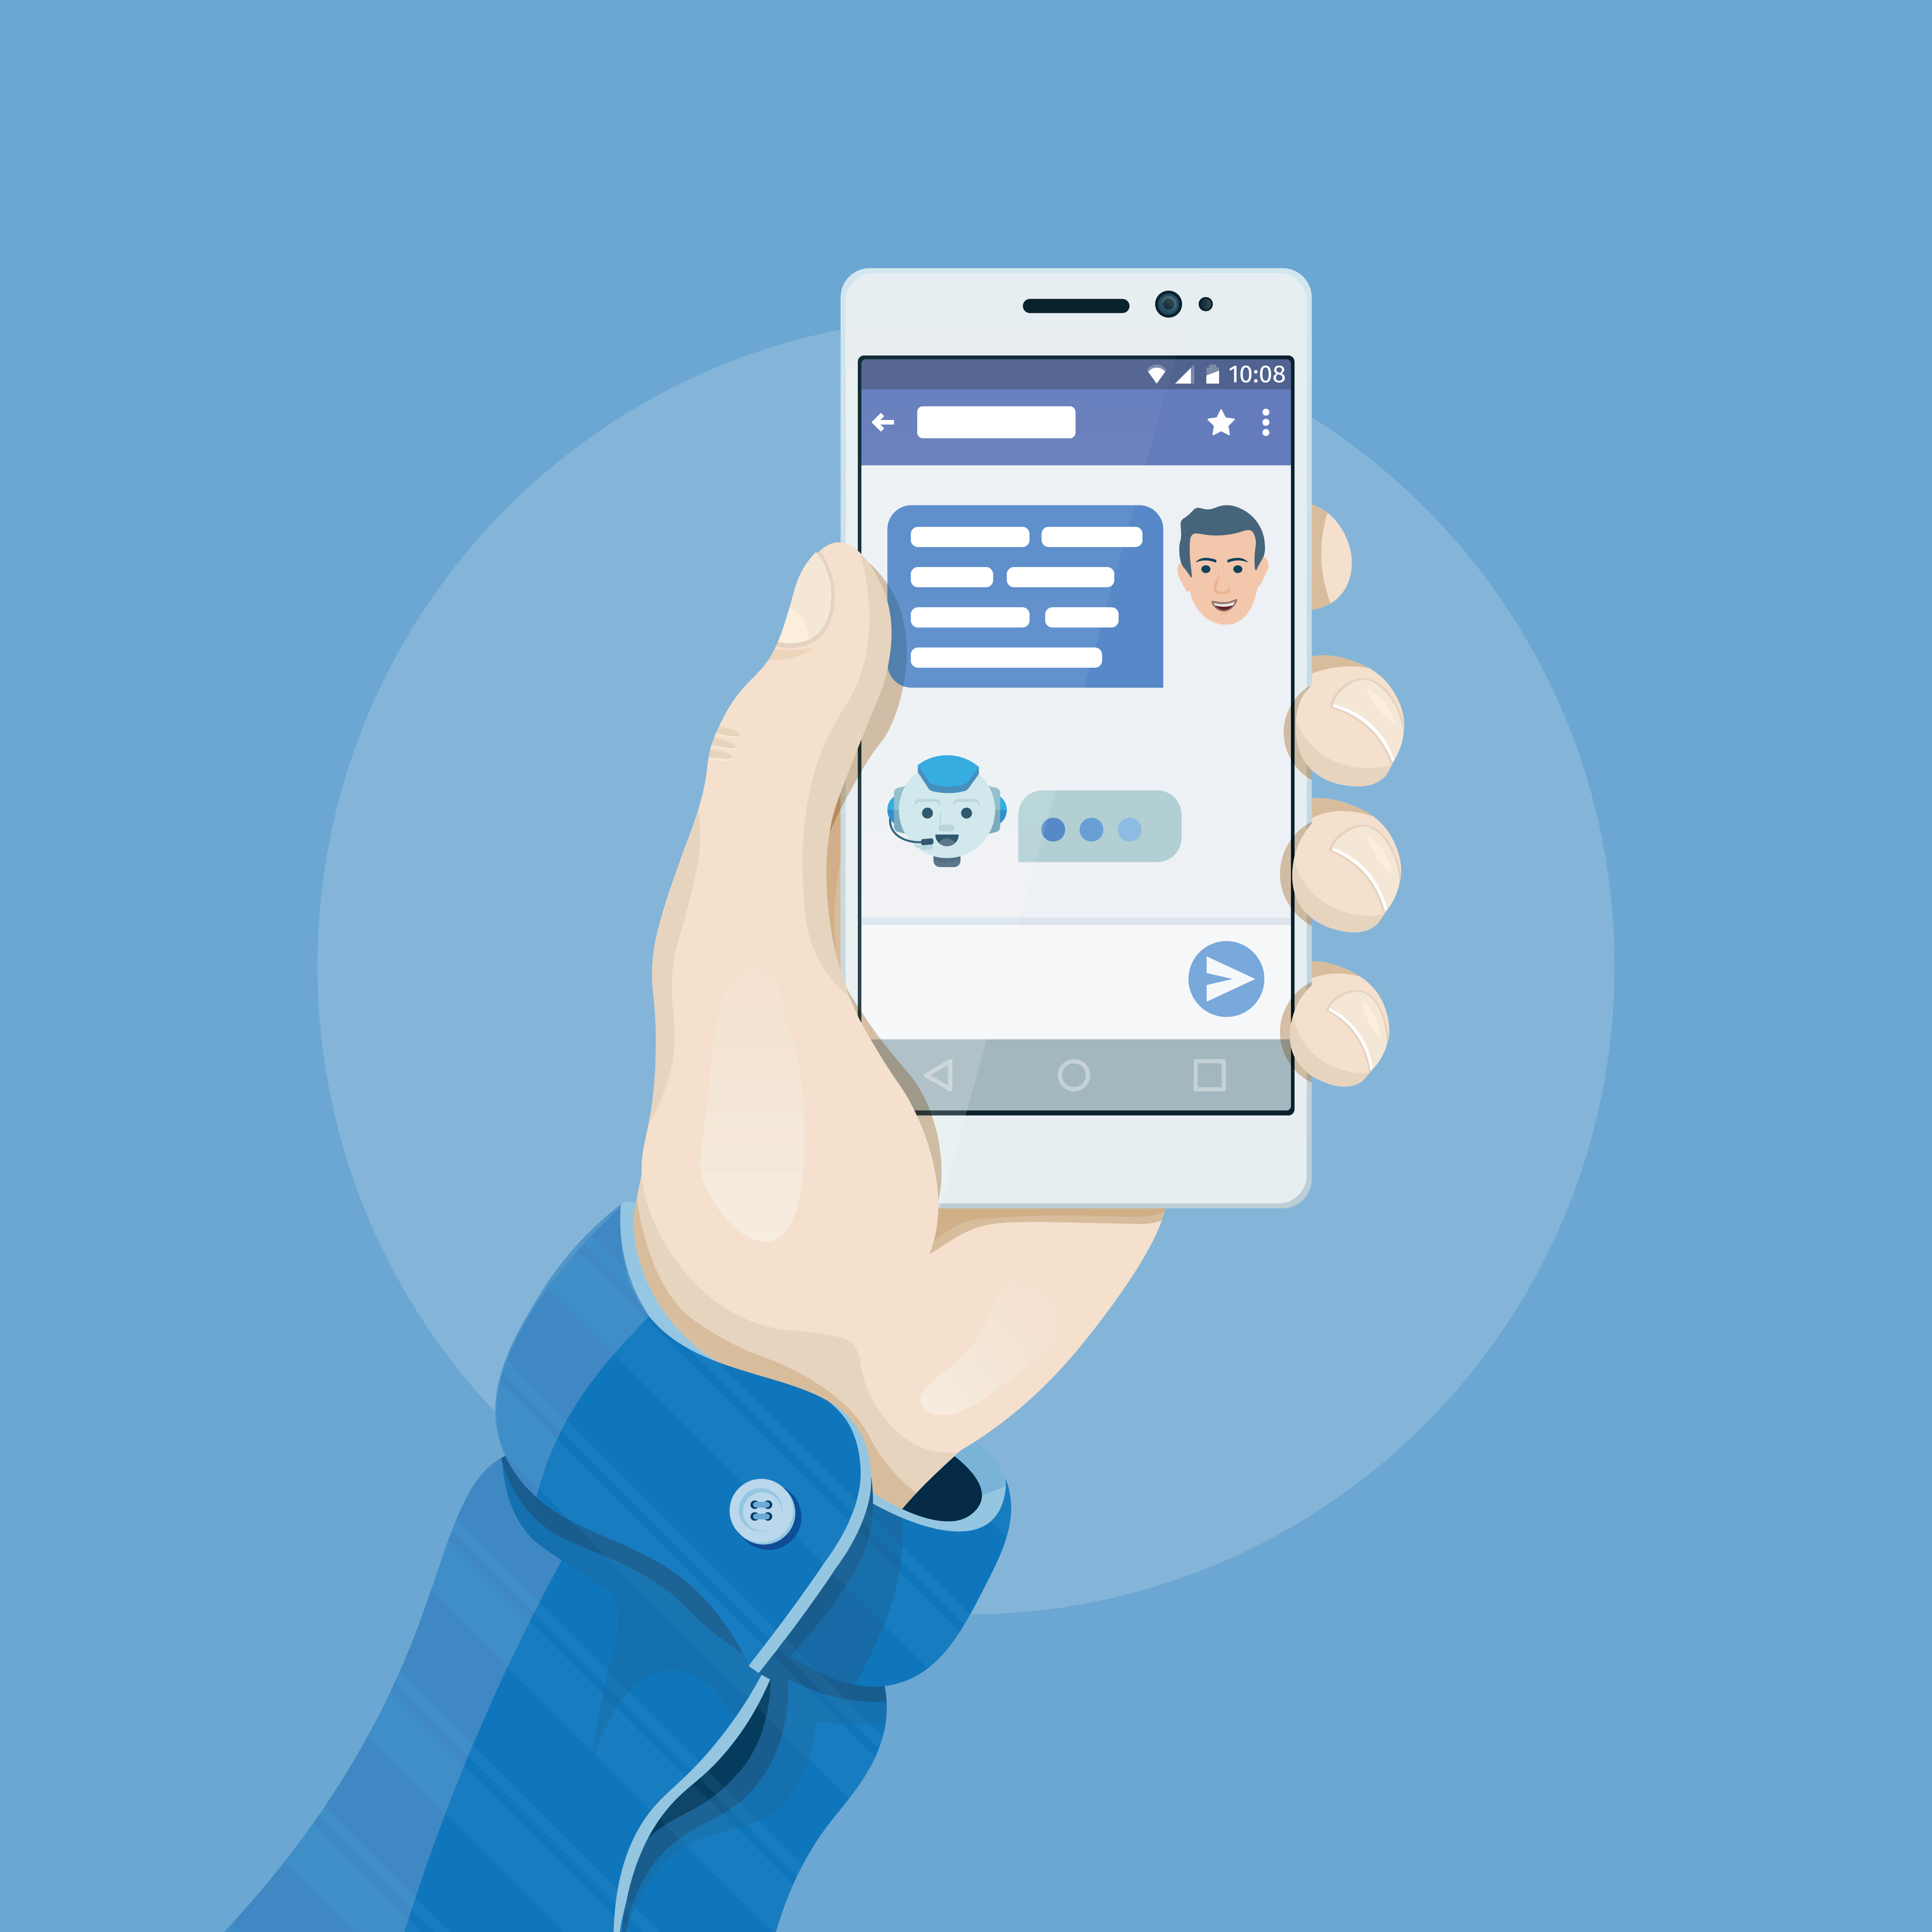 [Krok Po Kroku] Jak Ustawić Chat Bota w Facebook Messenger?